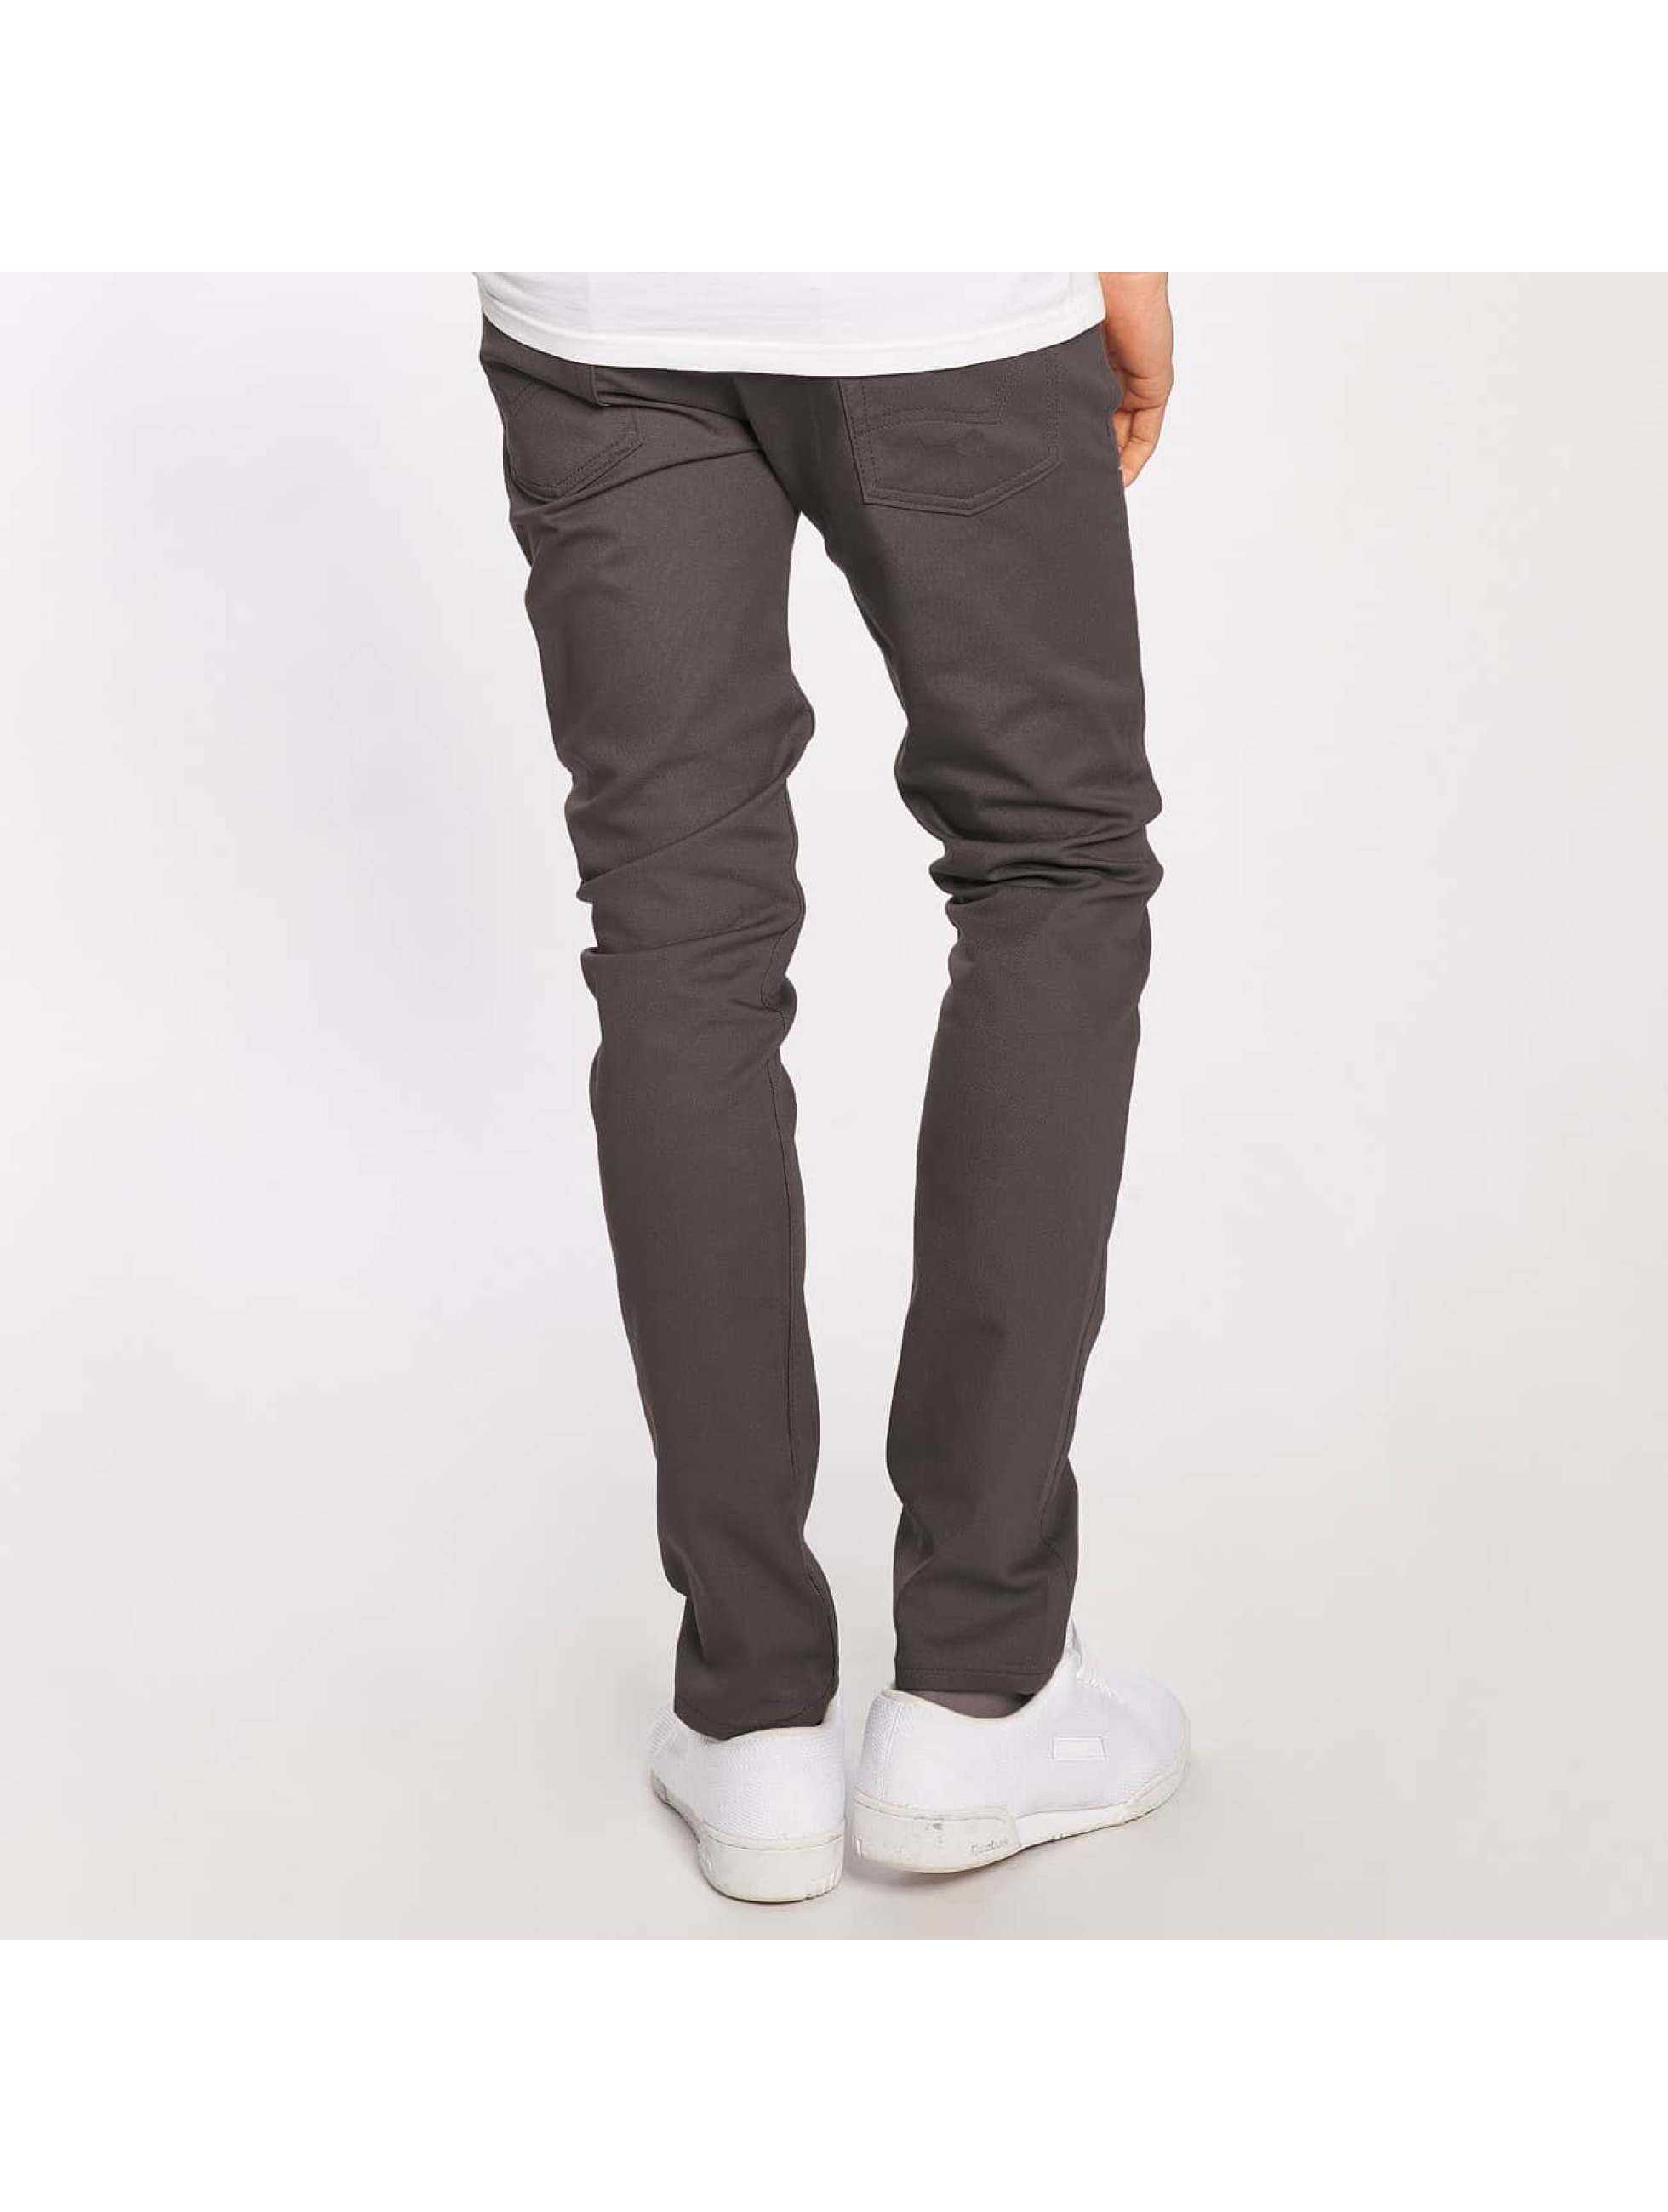 dickies herren jeans skinny jeans slim ebay. Black Bedroom Furniture Sets. Home Design Ideas